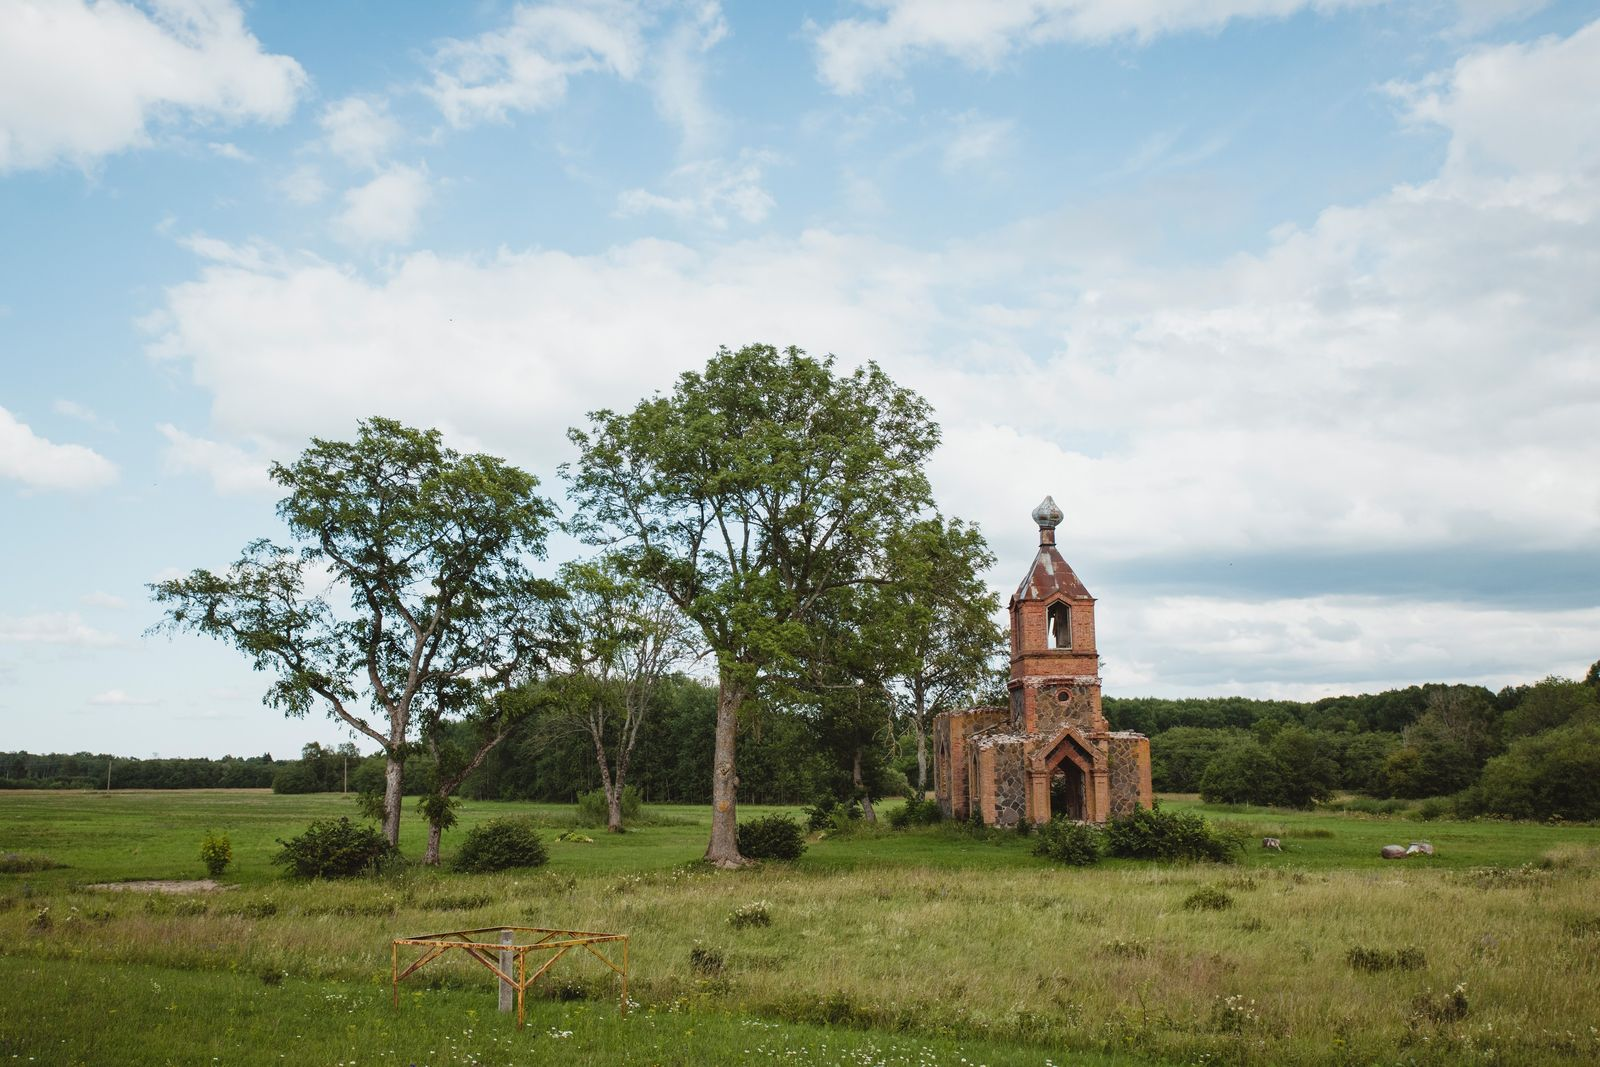 Destroyed Kullamaa Saint Nikolaus church in Lääne county, Estonia. Estonia had Christianity forced upon it, but ...